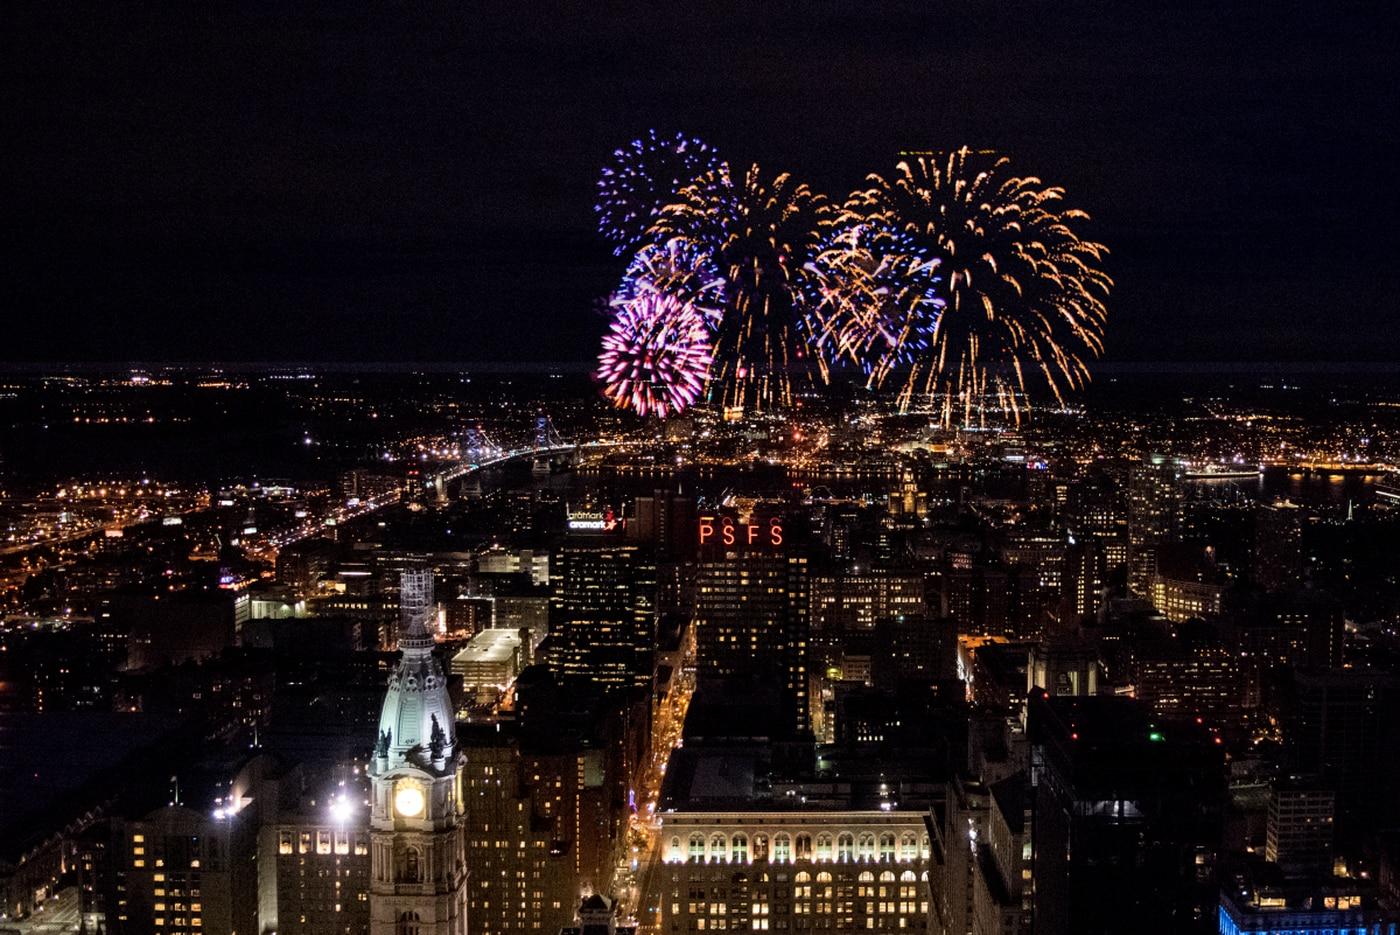 How to celebrate New Year's Eve in Philadelphia